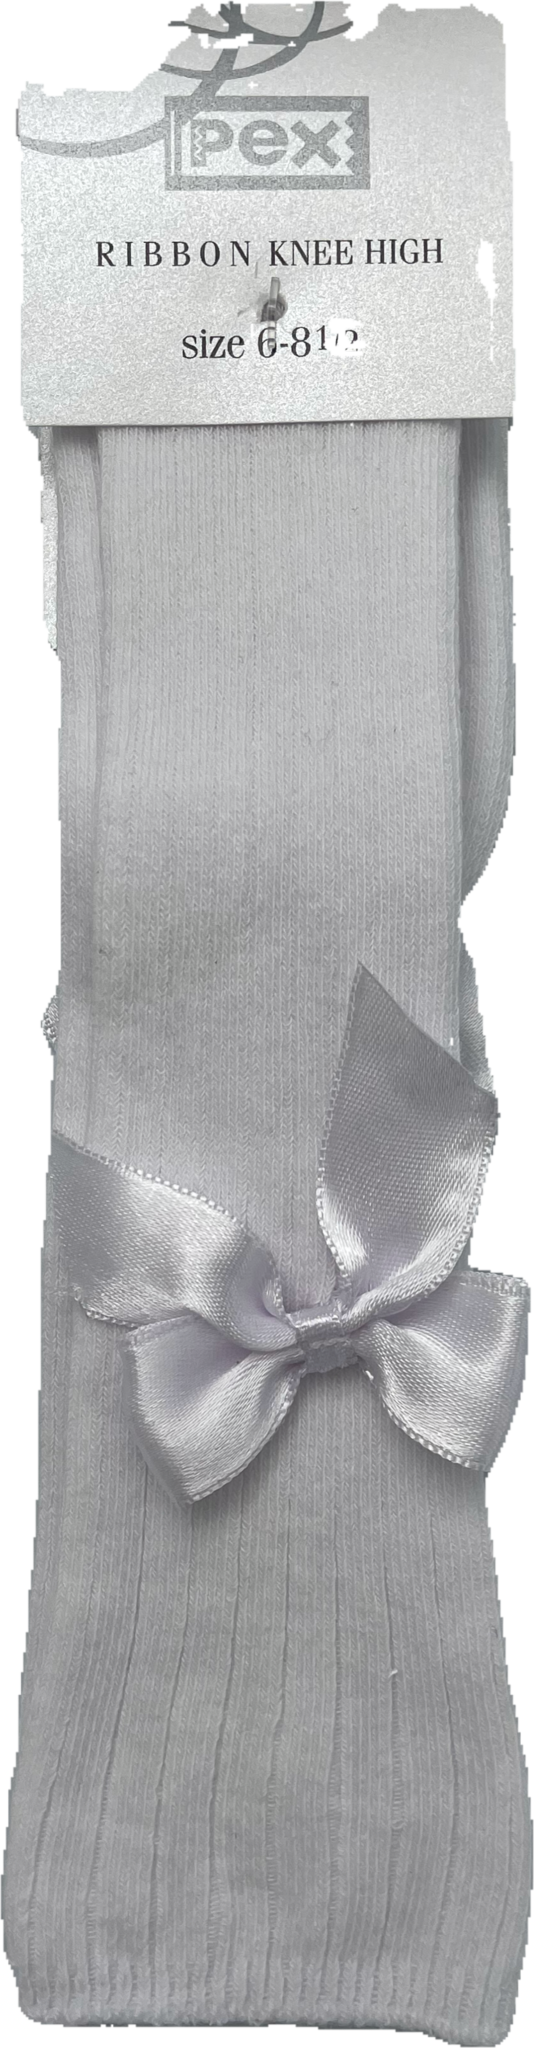 Pex Pex Carmen Knee High Socks White